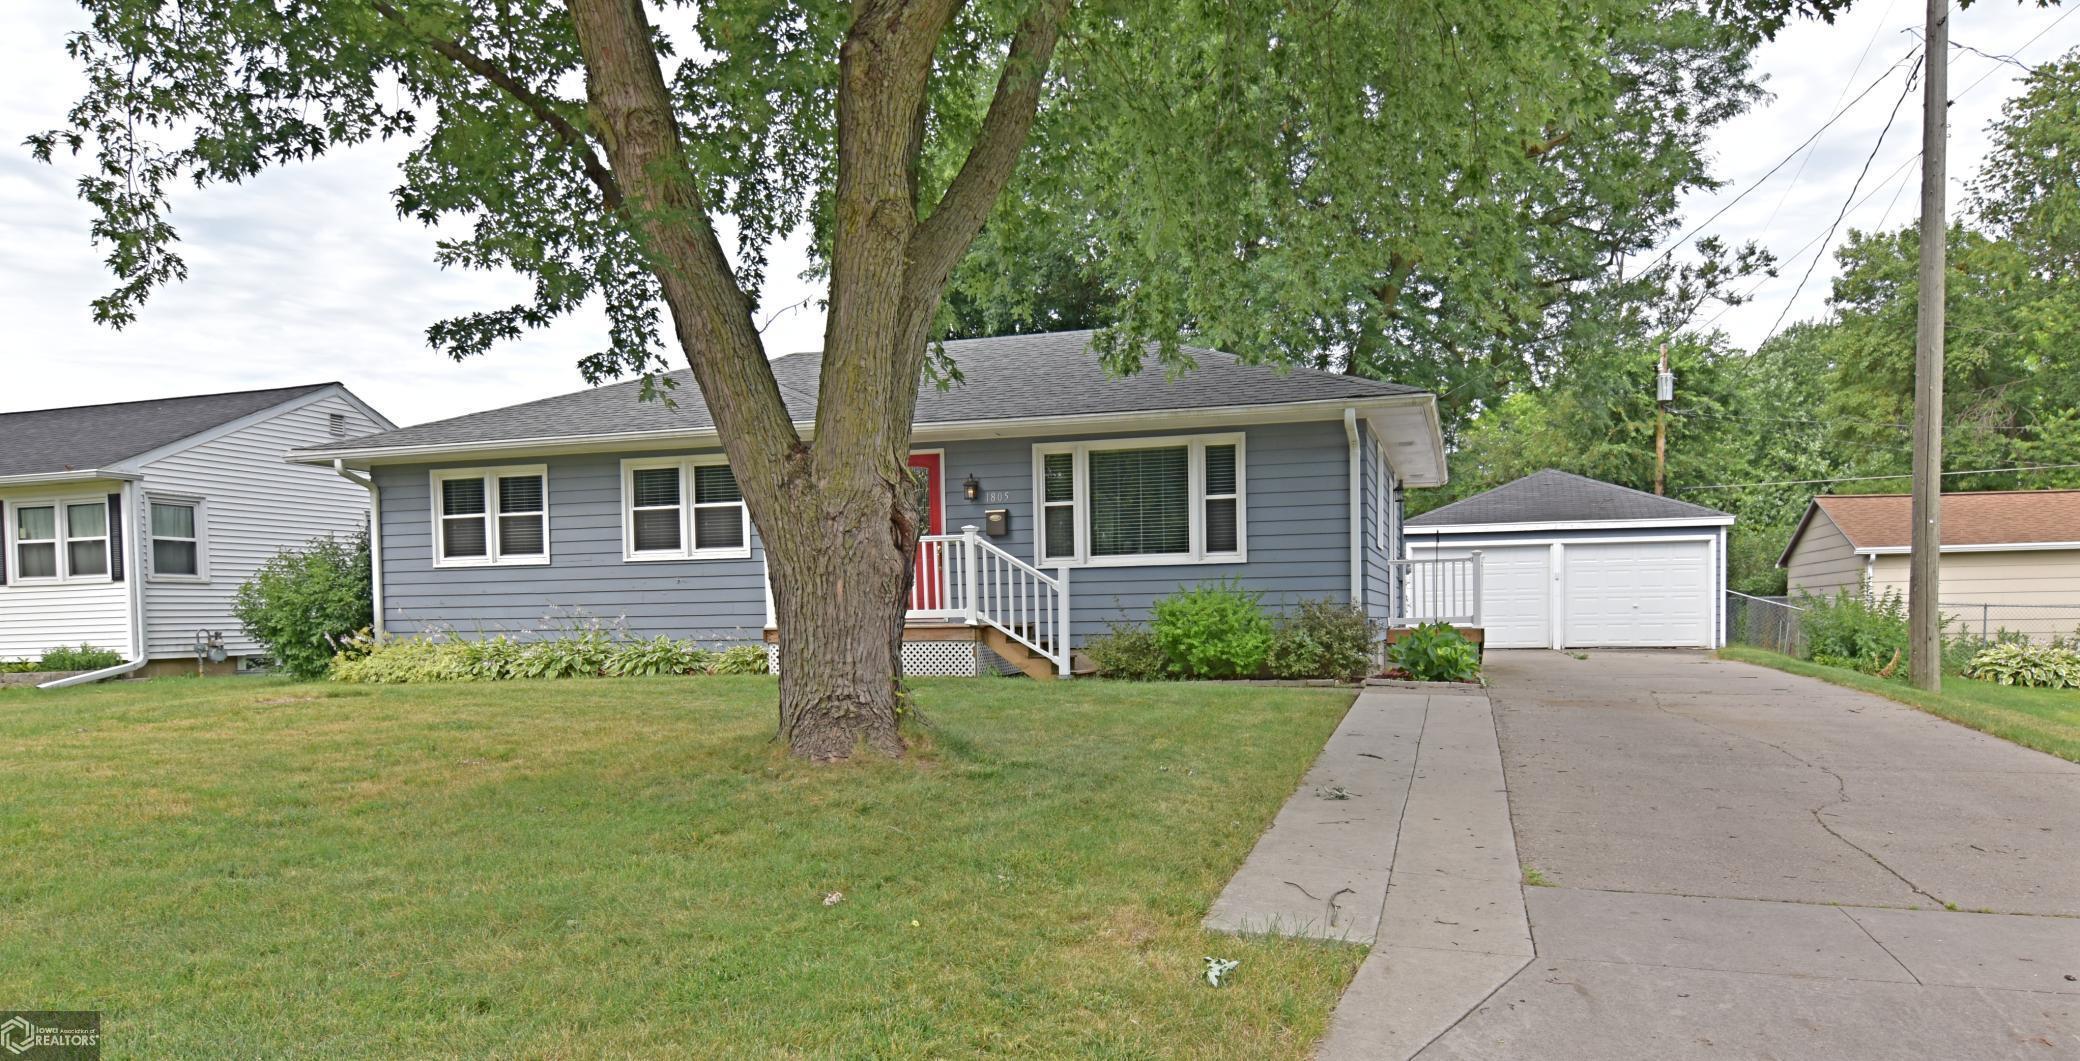 1805 5th Property Photo - Marshalltown, IA real estate listing